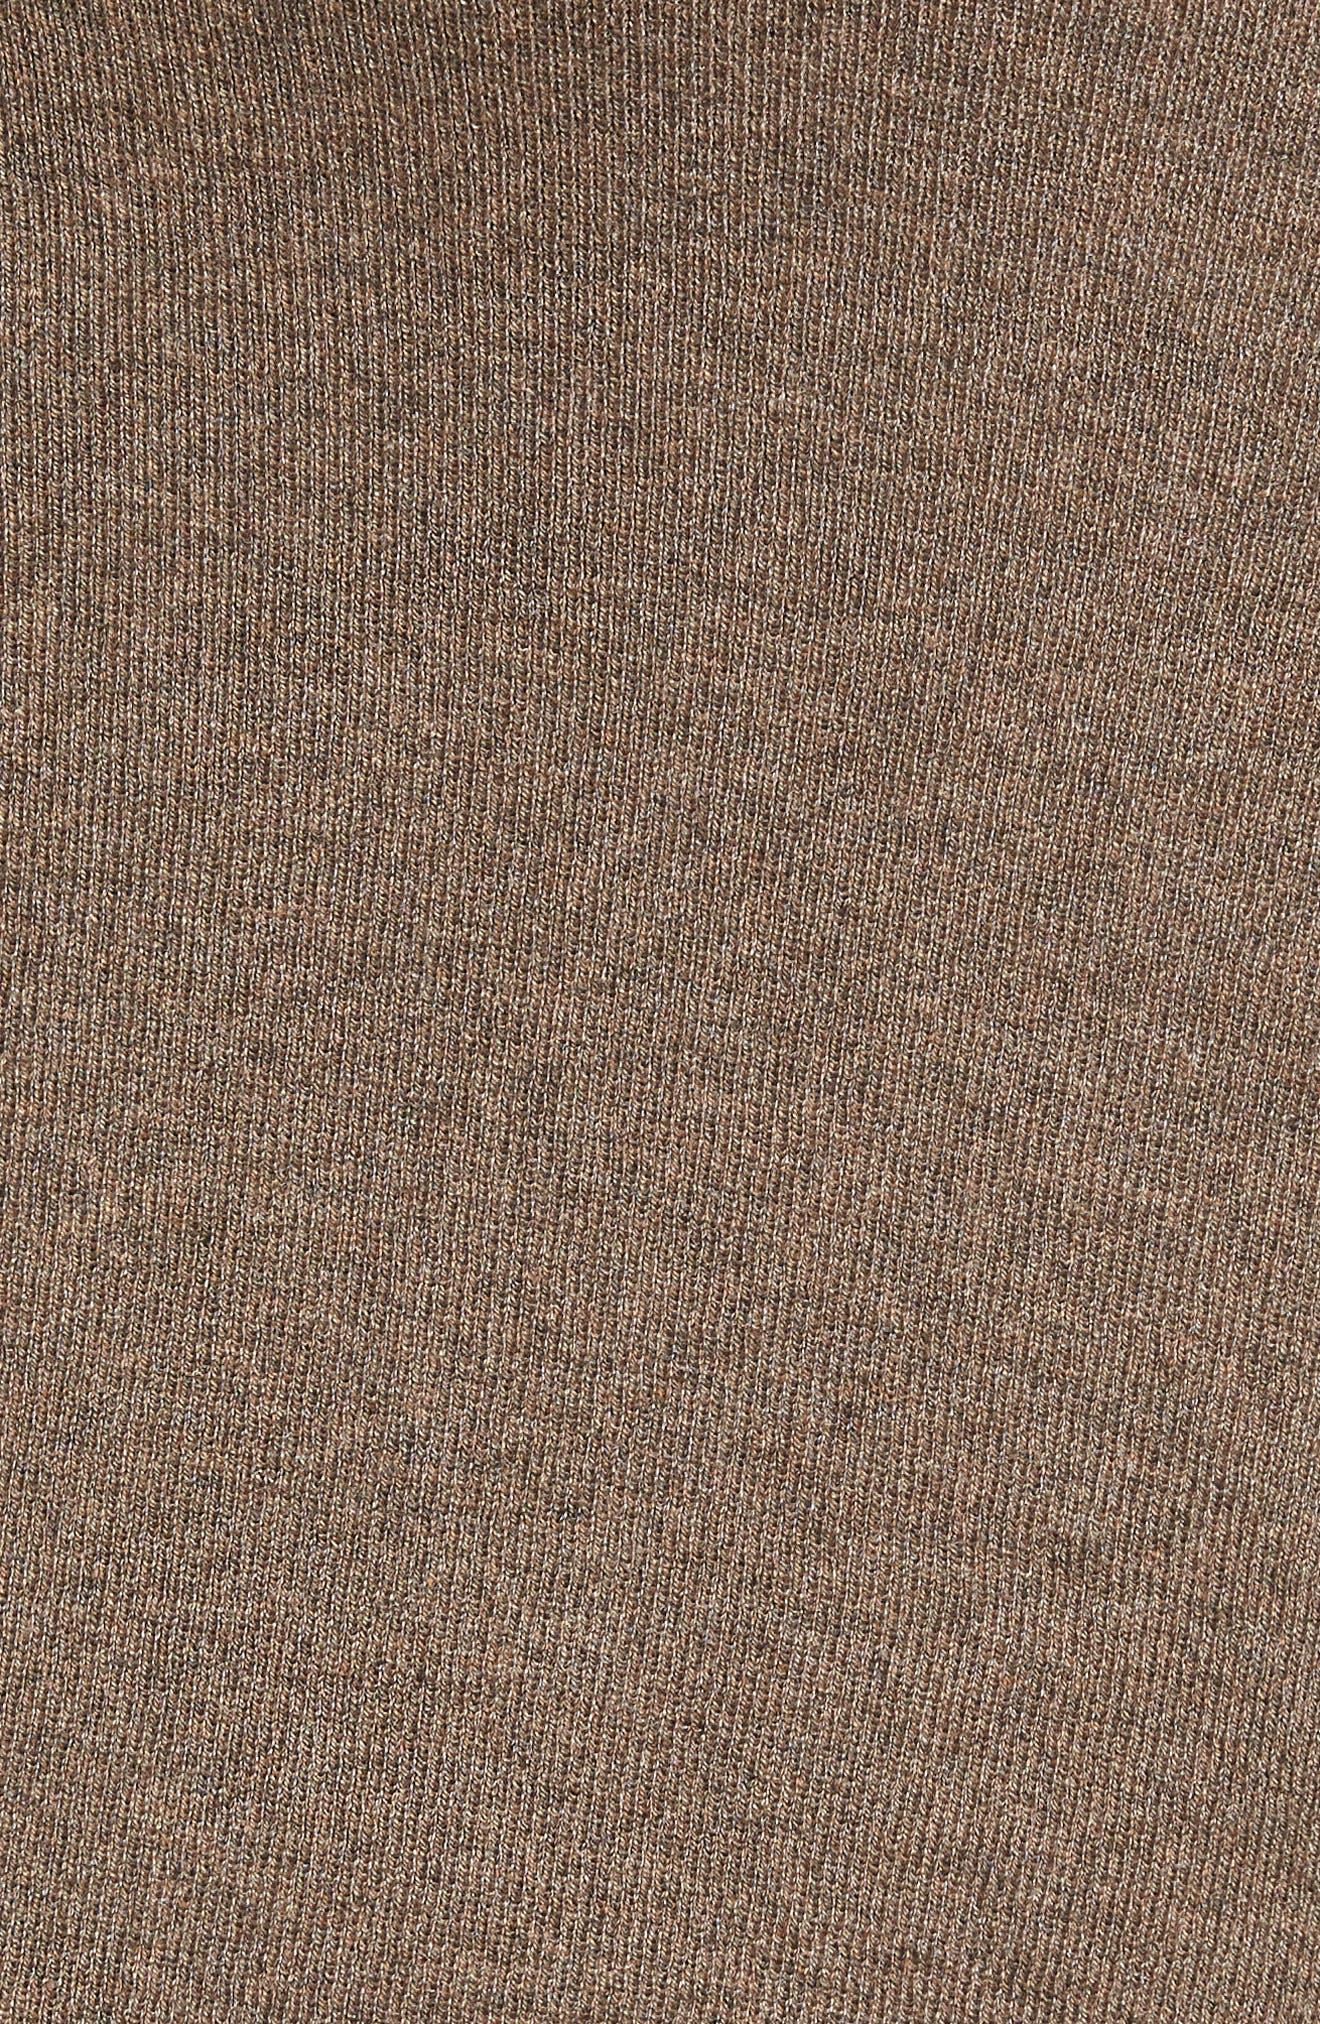 4-Way Convertible Lightweight Cardigan,                             Alternate thumbnail 315, color,